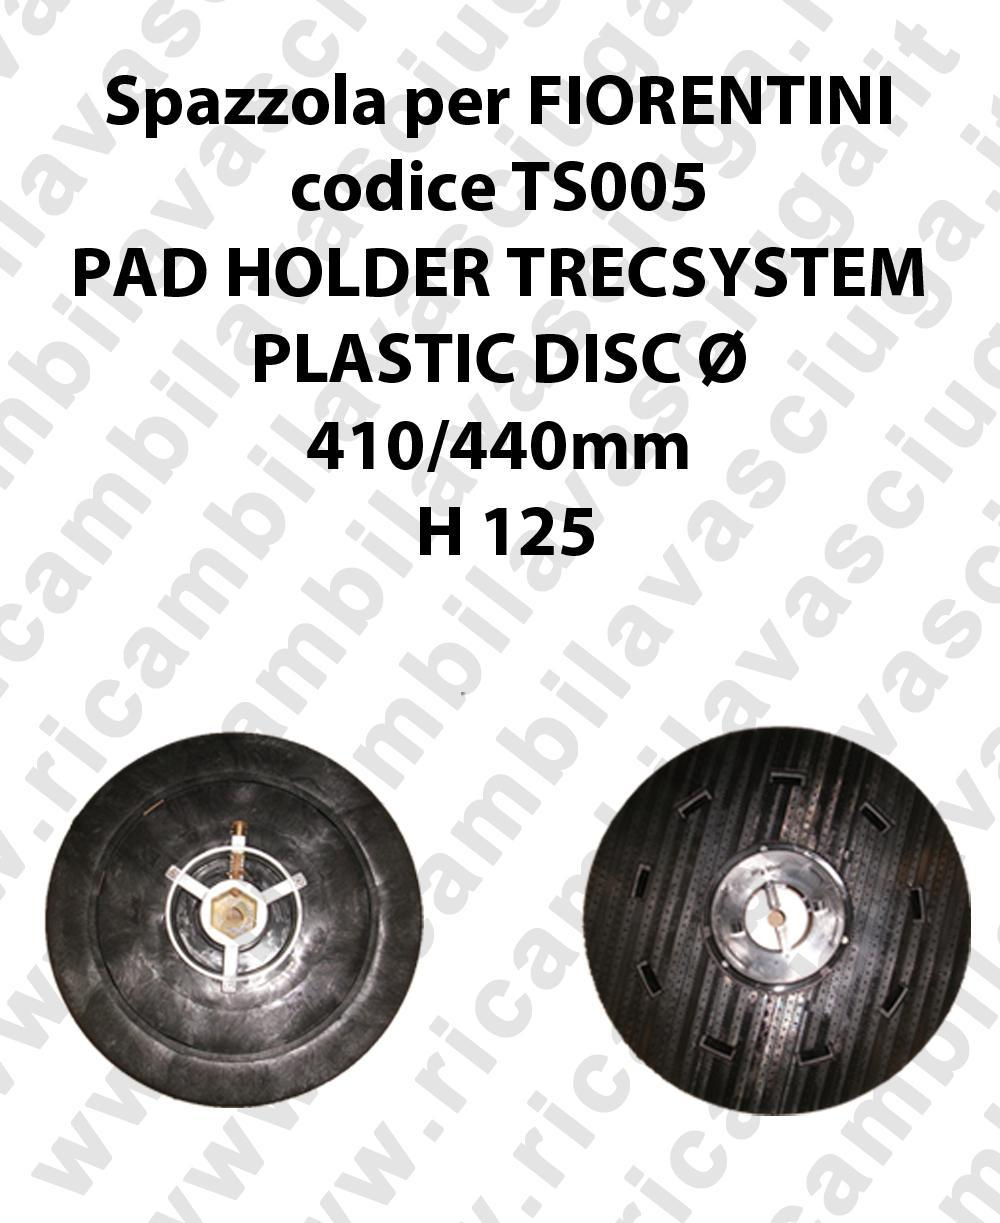 PAD HOLDER TRECSYSTEM  para fregadora FIORENTINI